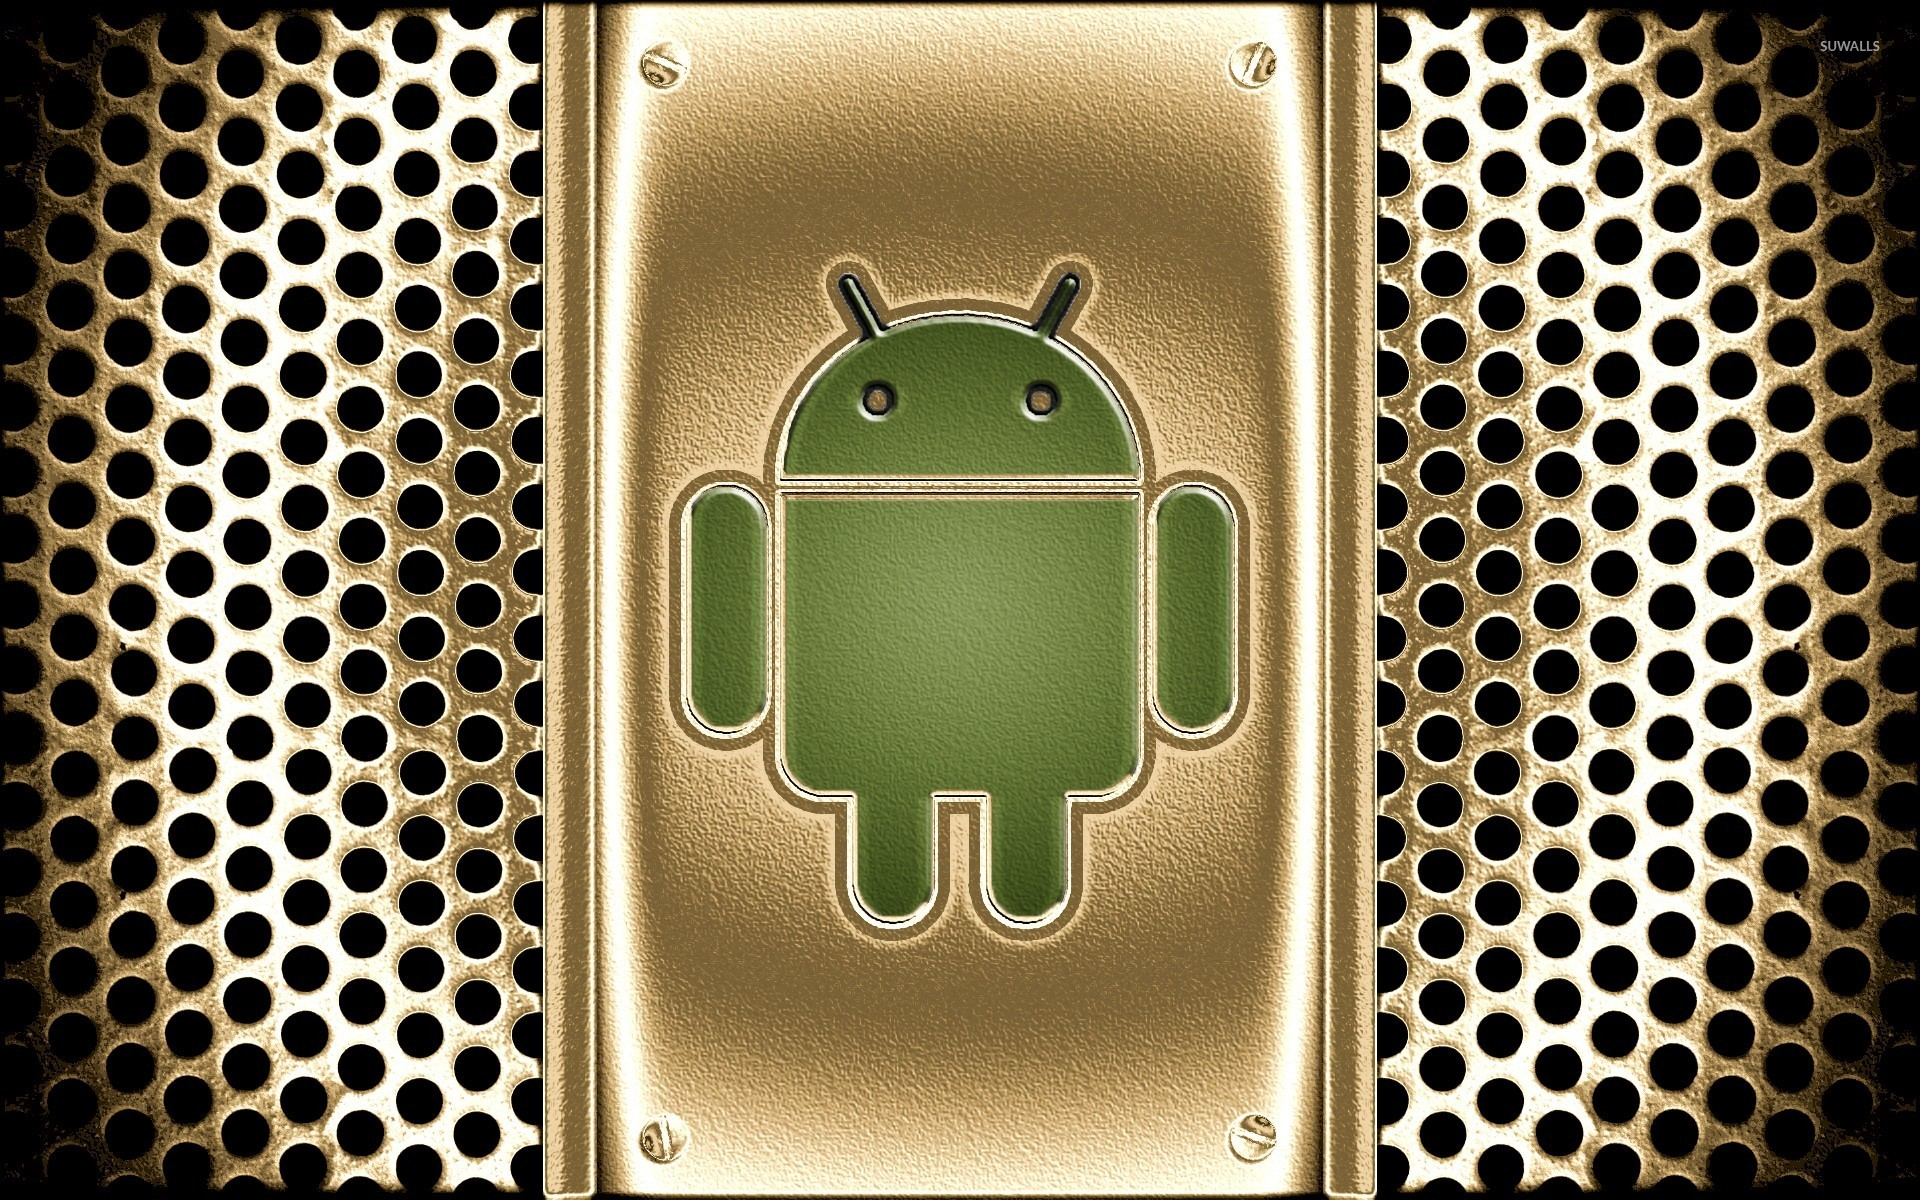 Golden Android logo wallpaper - Computer wallpapers - #22976Golden Android logo wallpaper